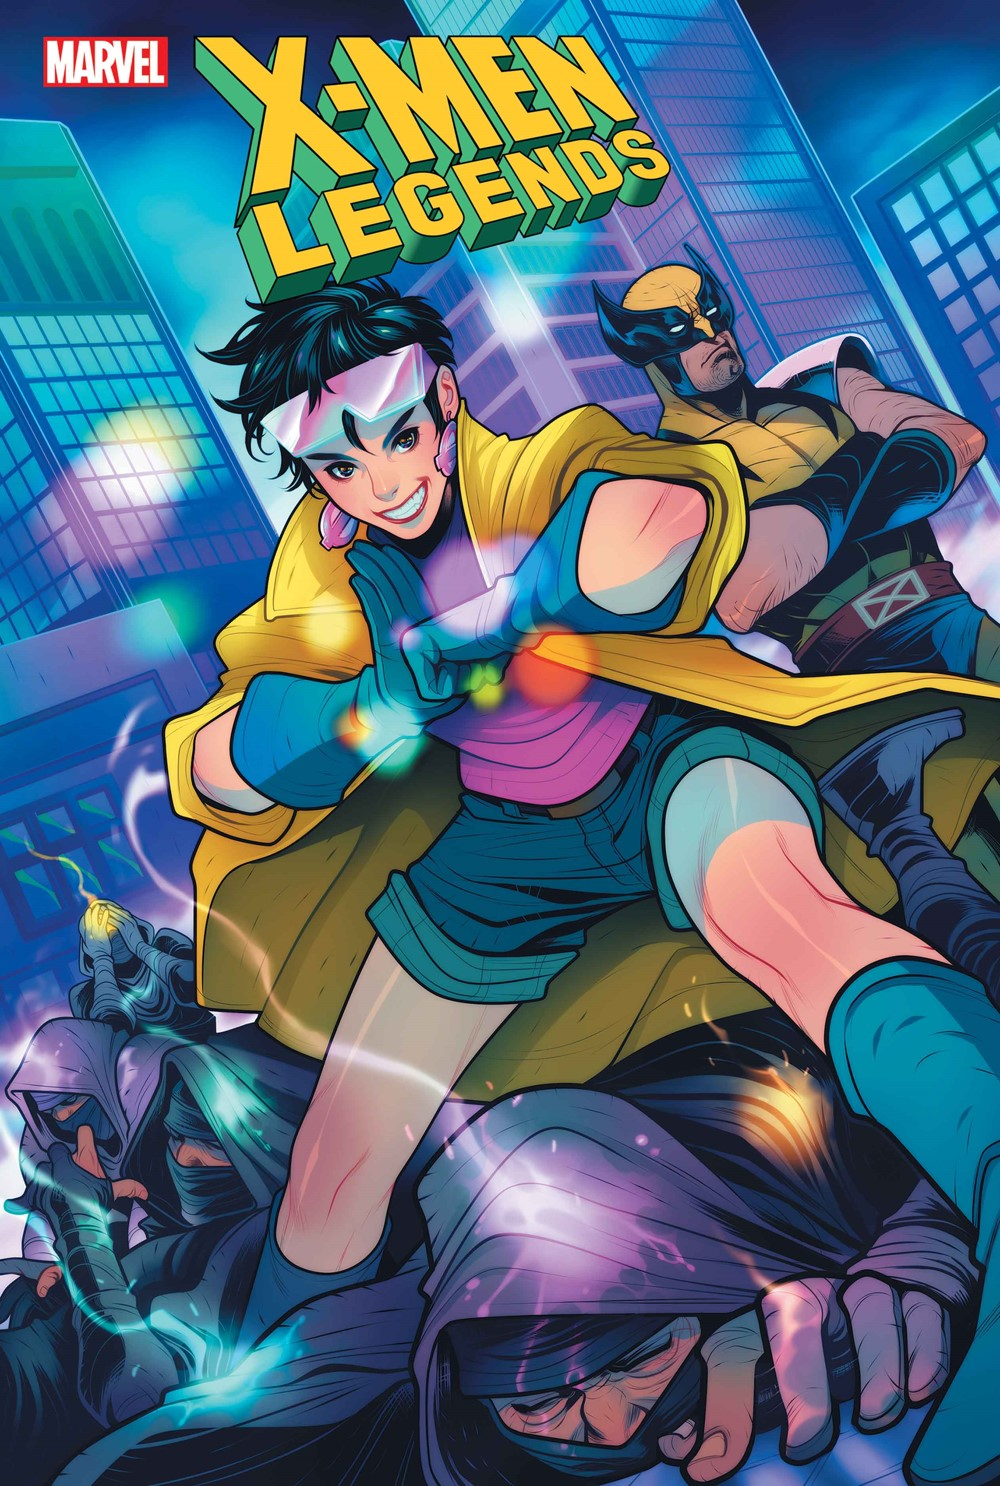 XMLEGENDS2021007_TORQUE_var Marvel Comics September 2021 Solicitations